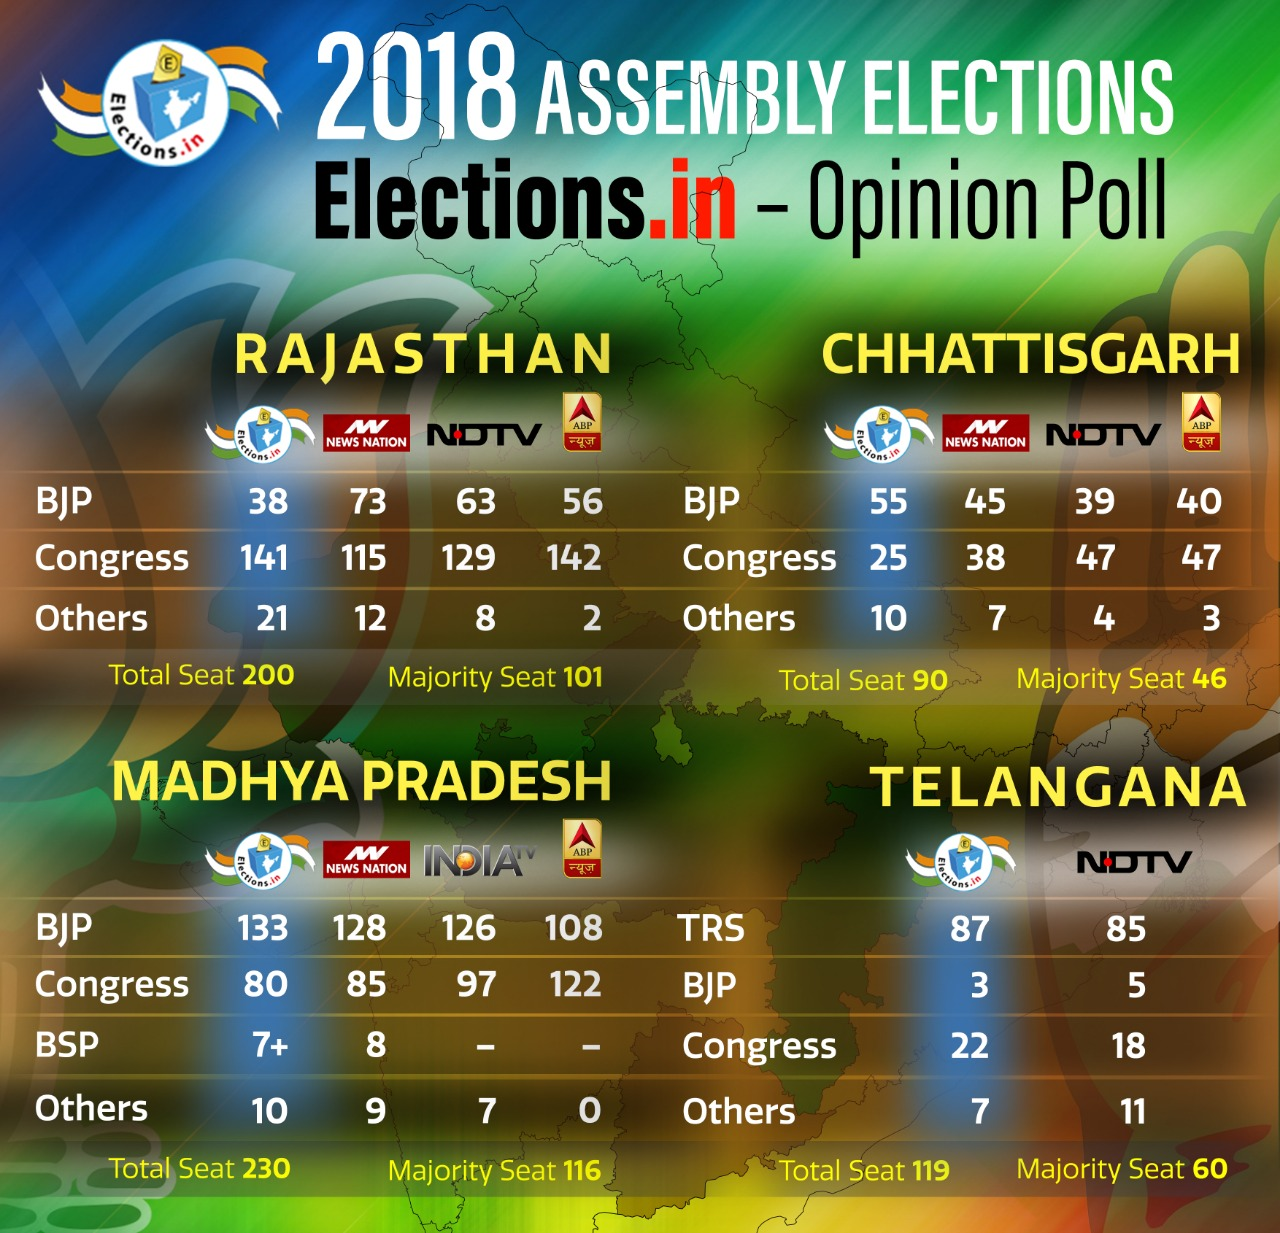 Opinion poll 2018